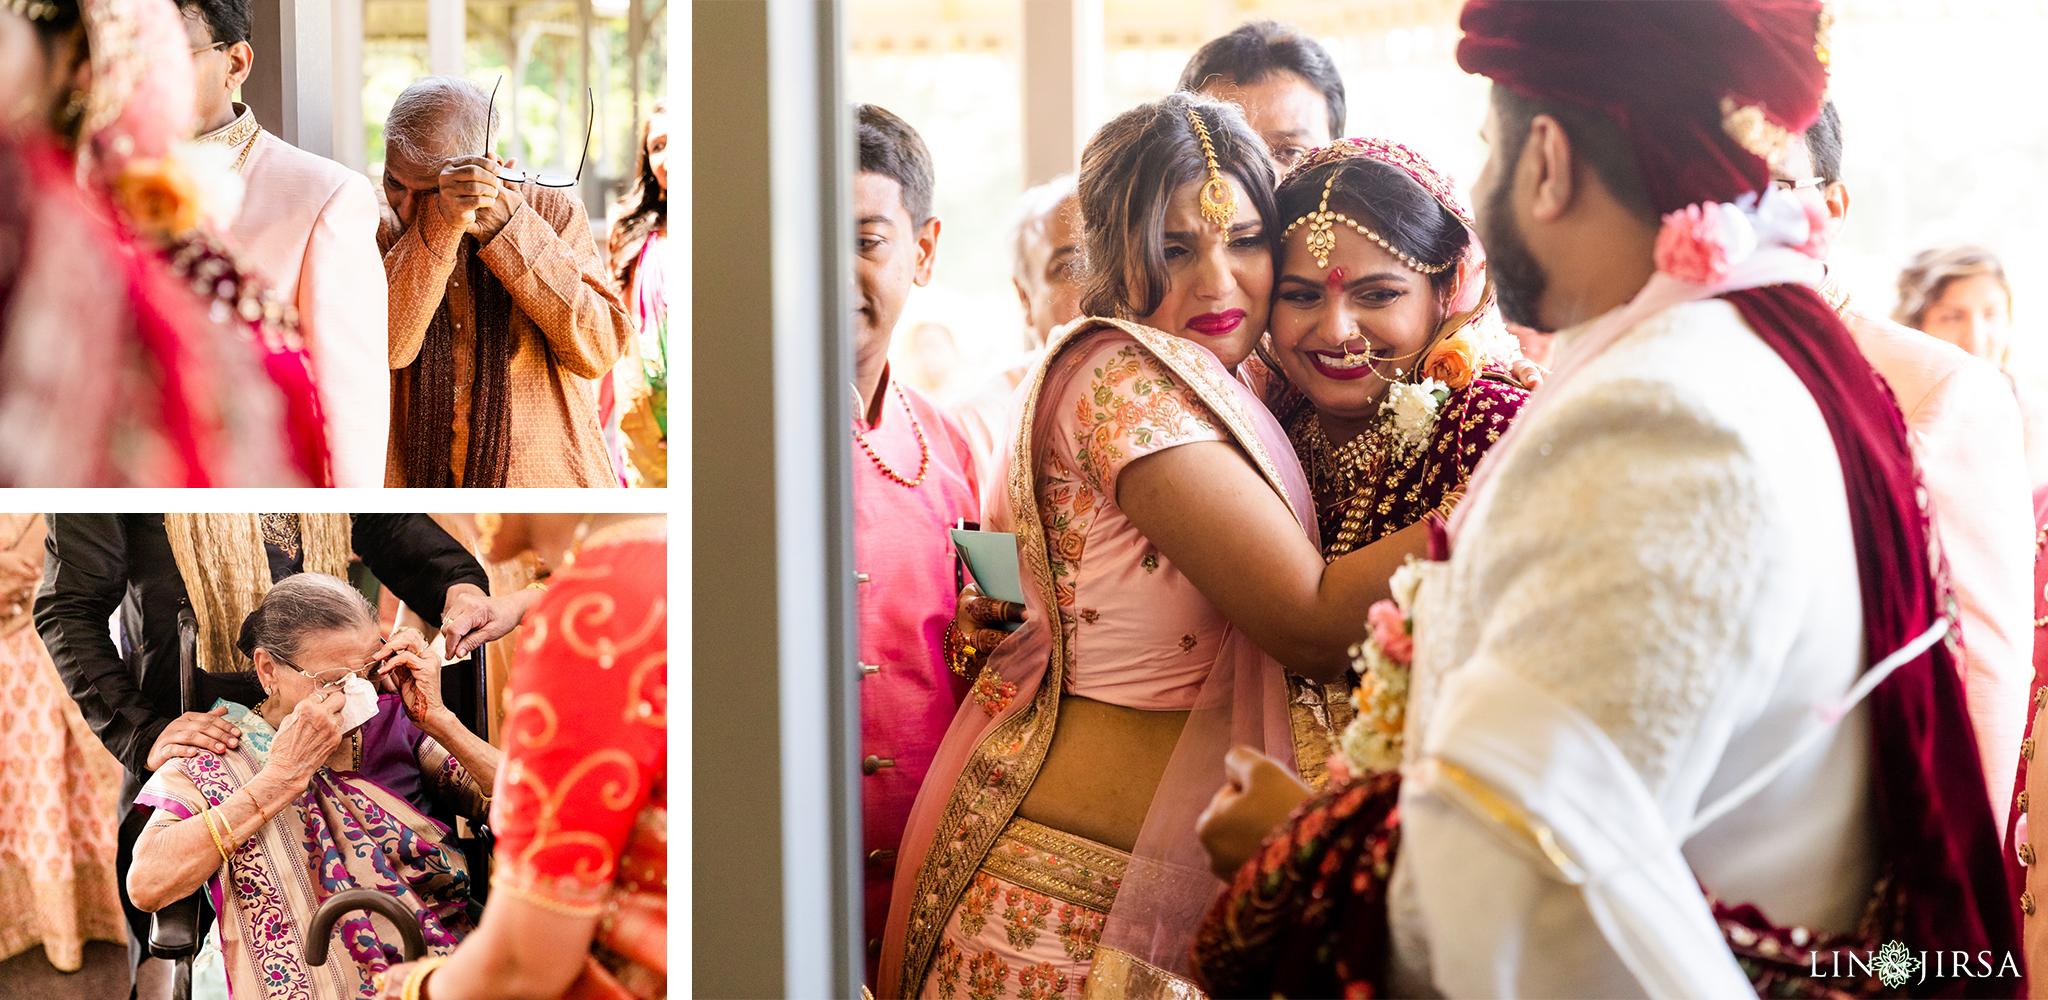 29 Delta Hotels Chesapeake Norfolk Virginia Indian Wedding Photography